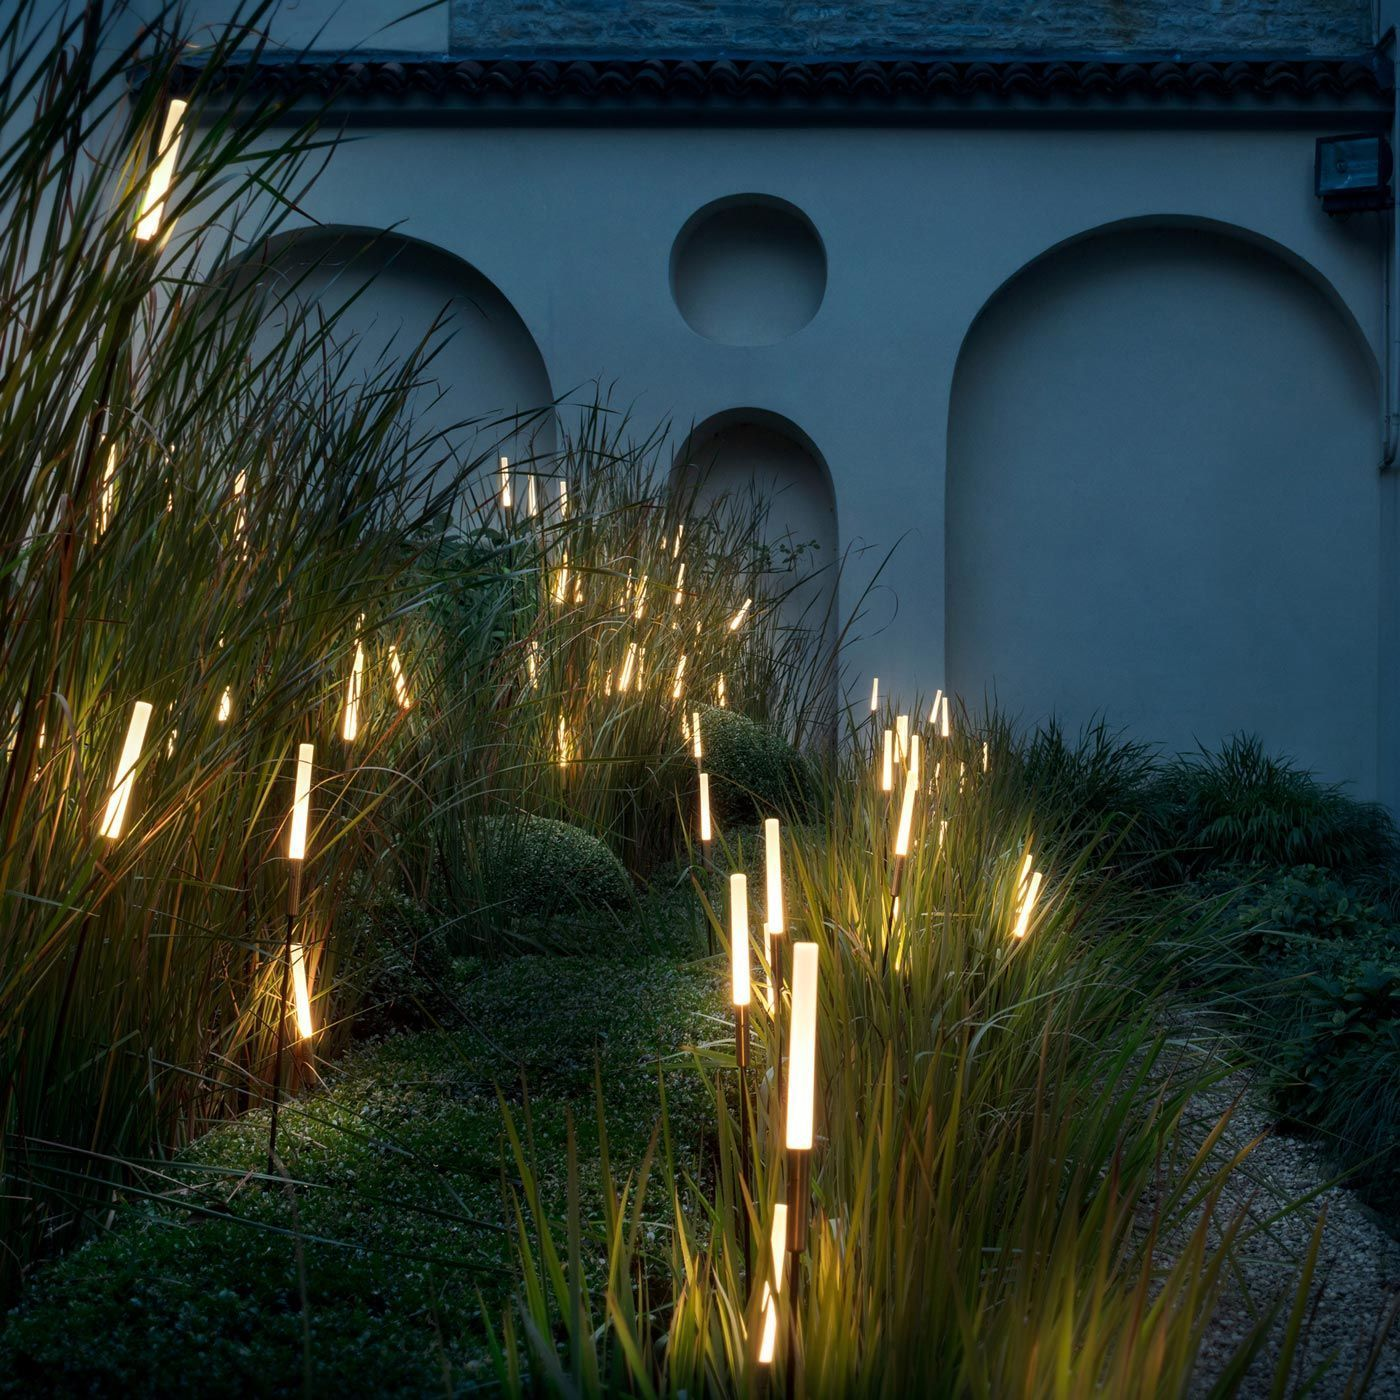 Syphasera Outdoor Spike Lamp In 2020 Led Garden Lights Outdoor Path Lighting Minimalist Garden